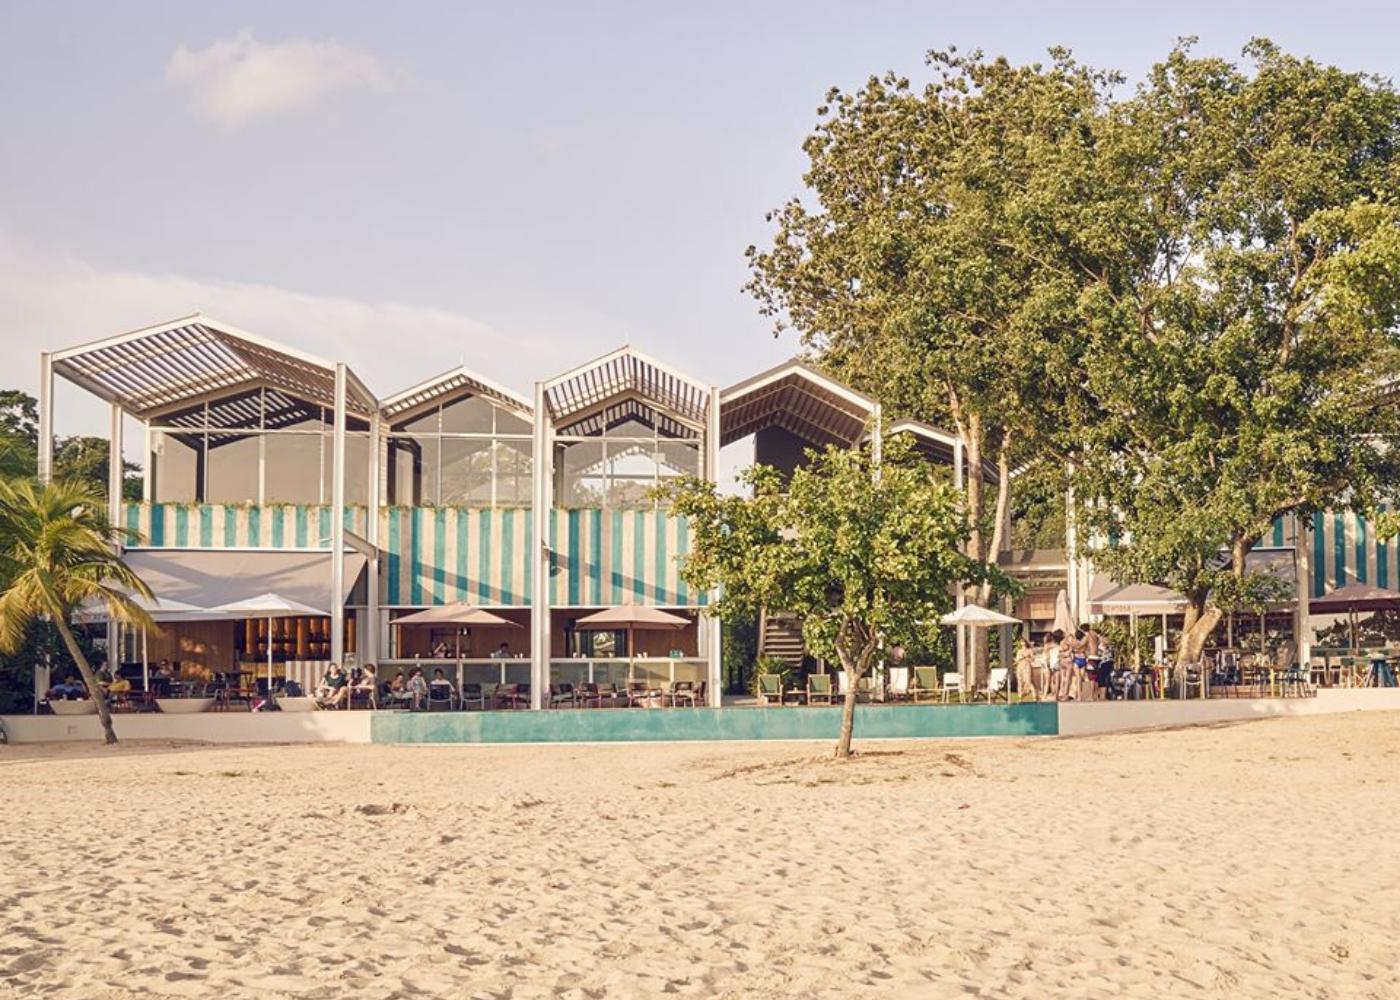 foc sentosa beach | Alfresco dining in Singapore